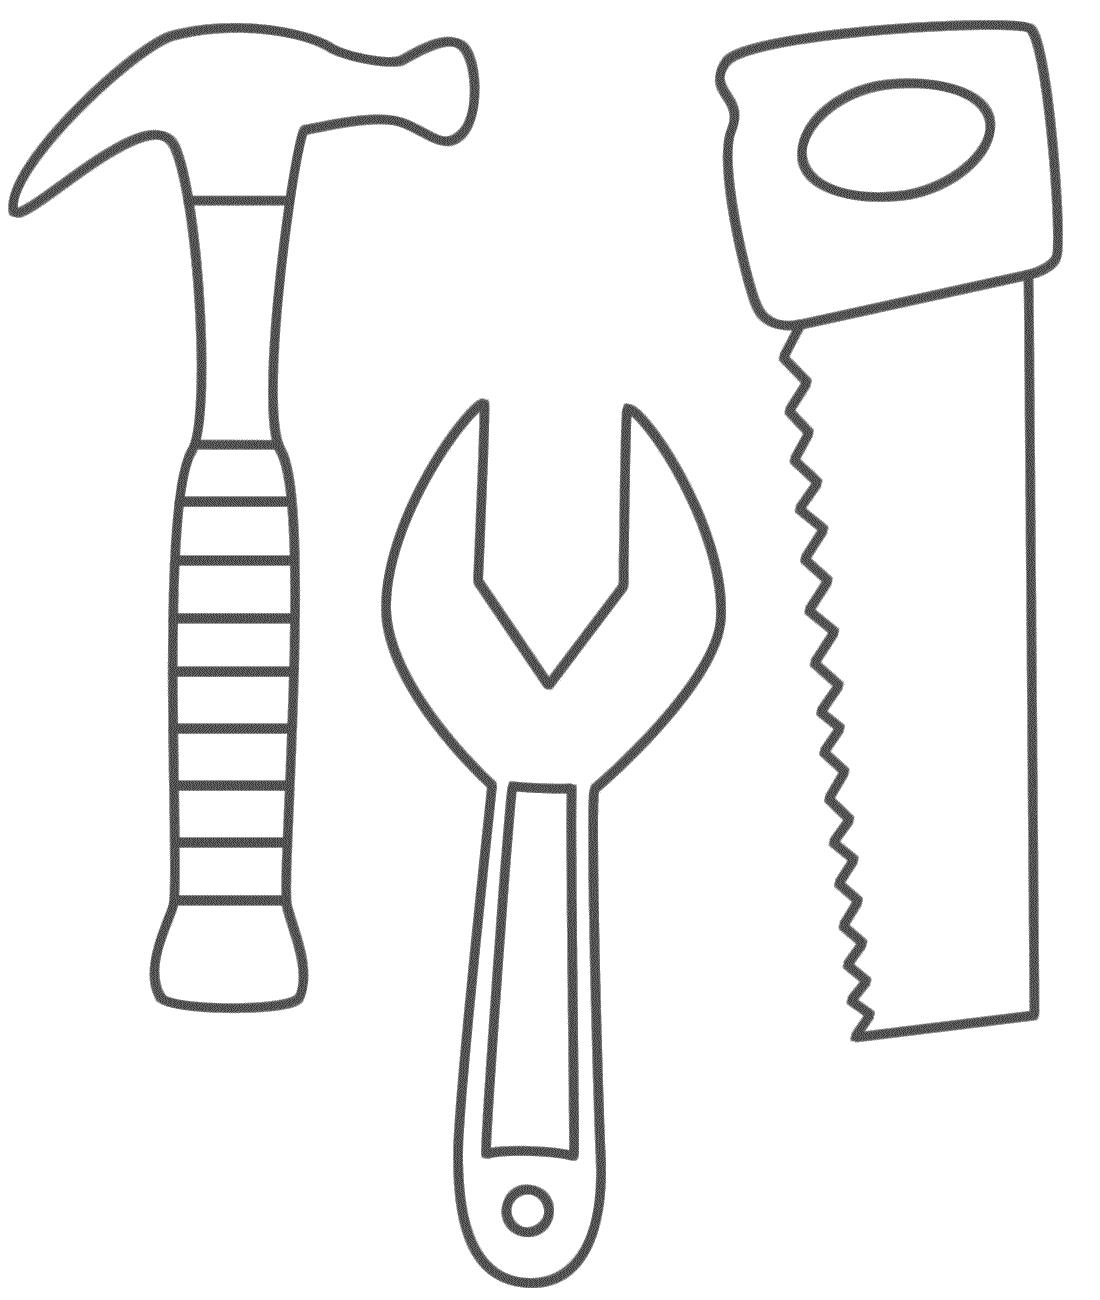 Hammer coloring #14, Download drawings